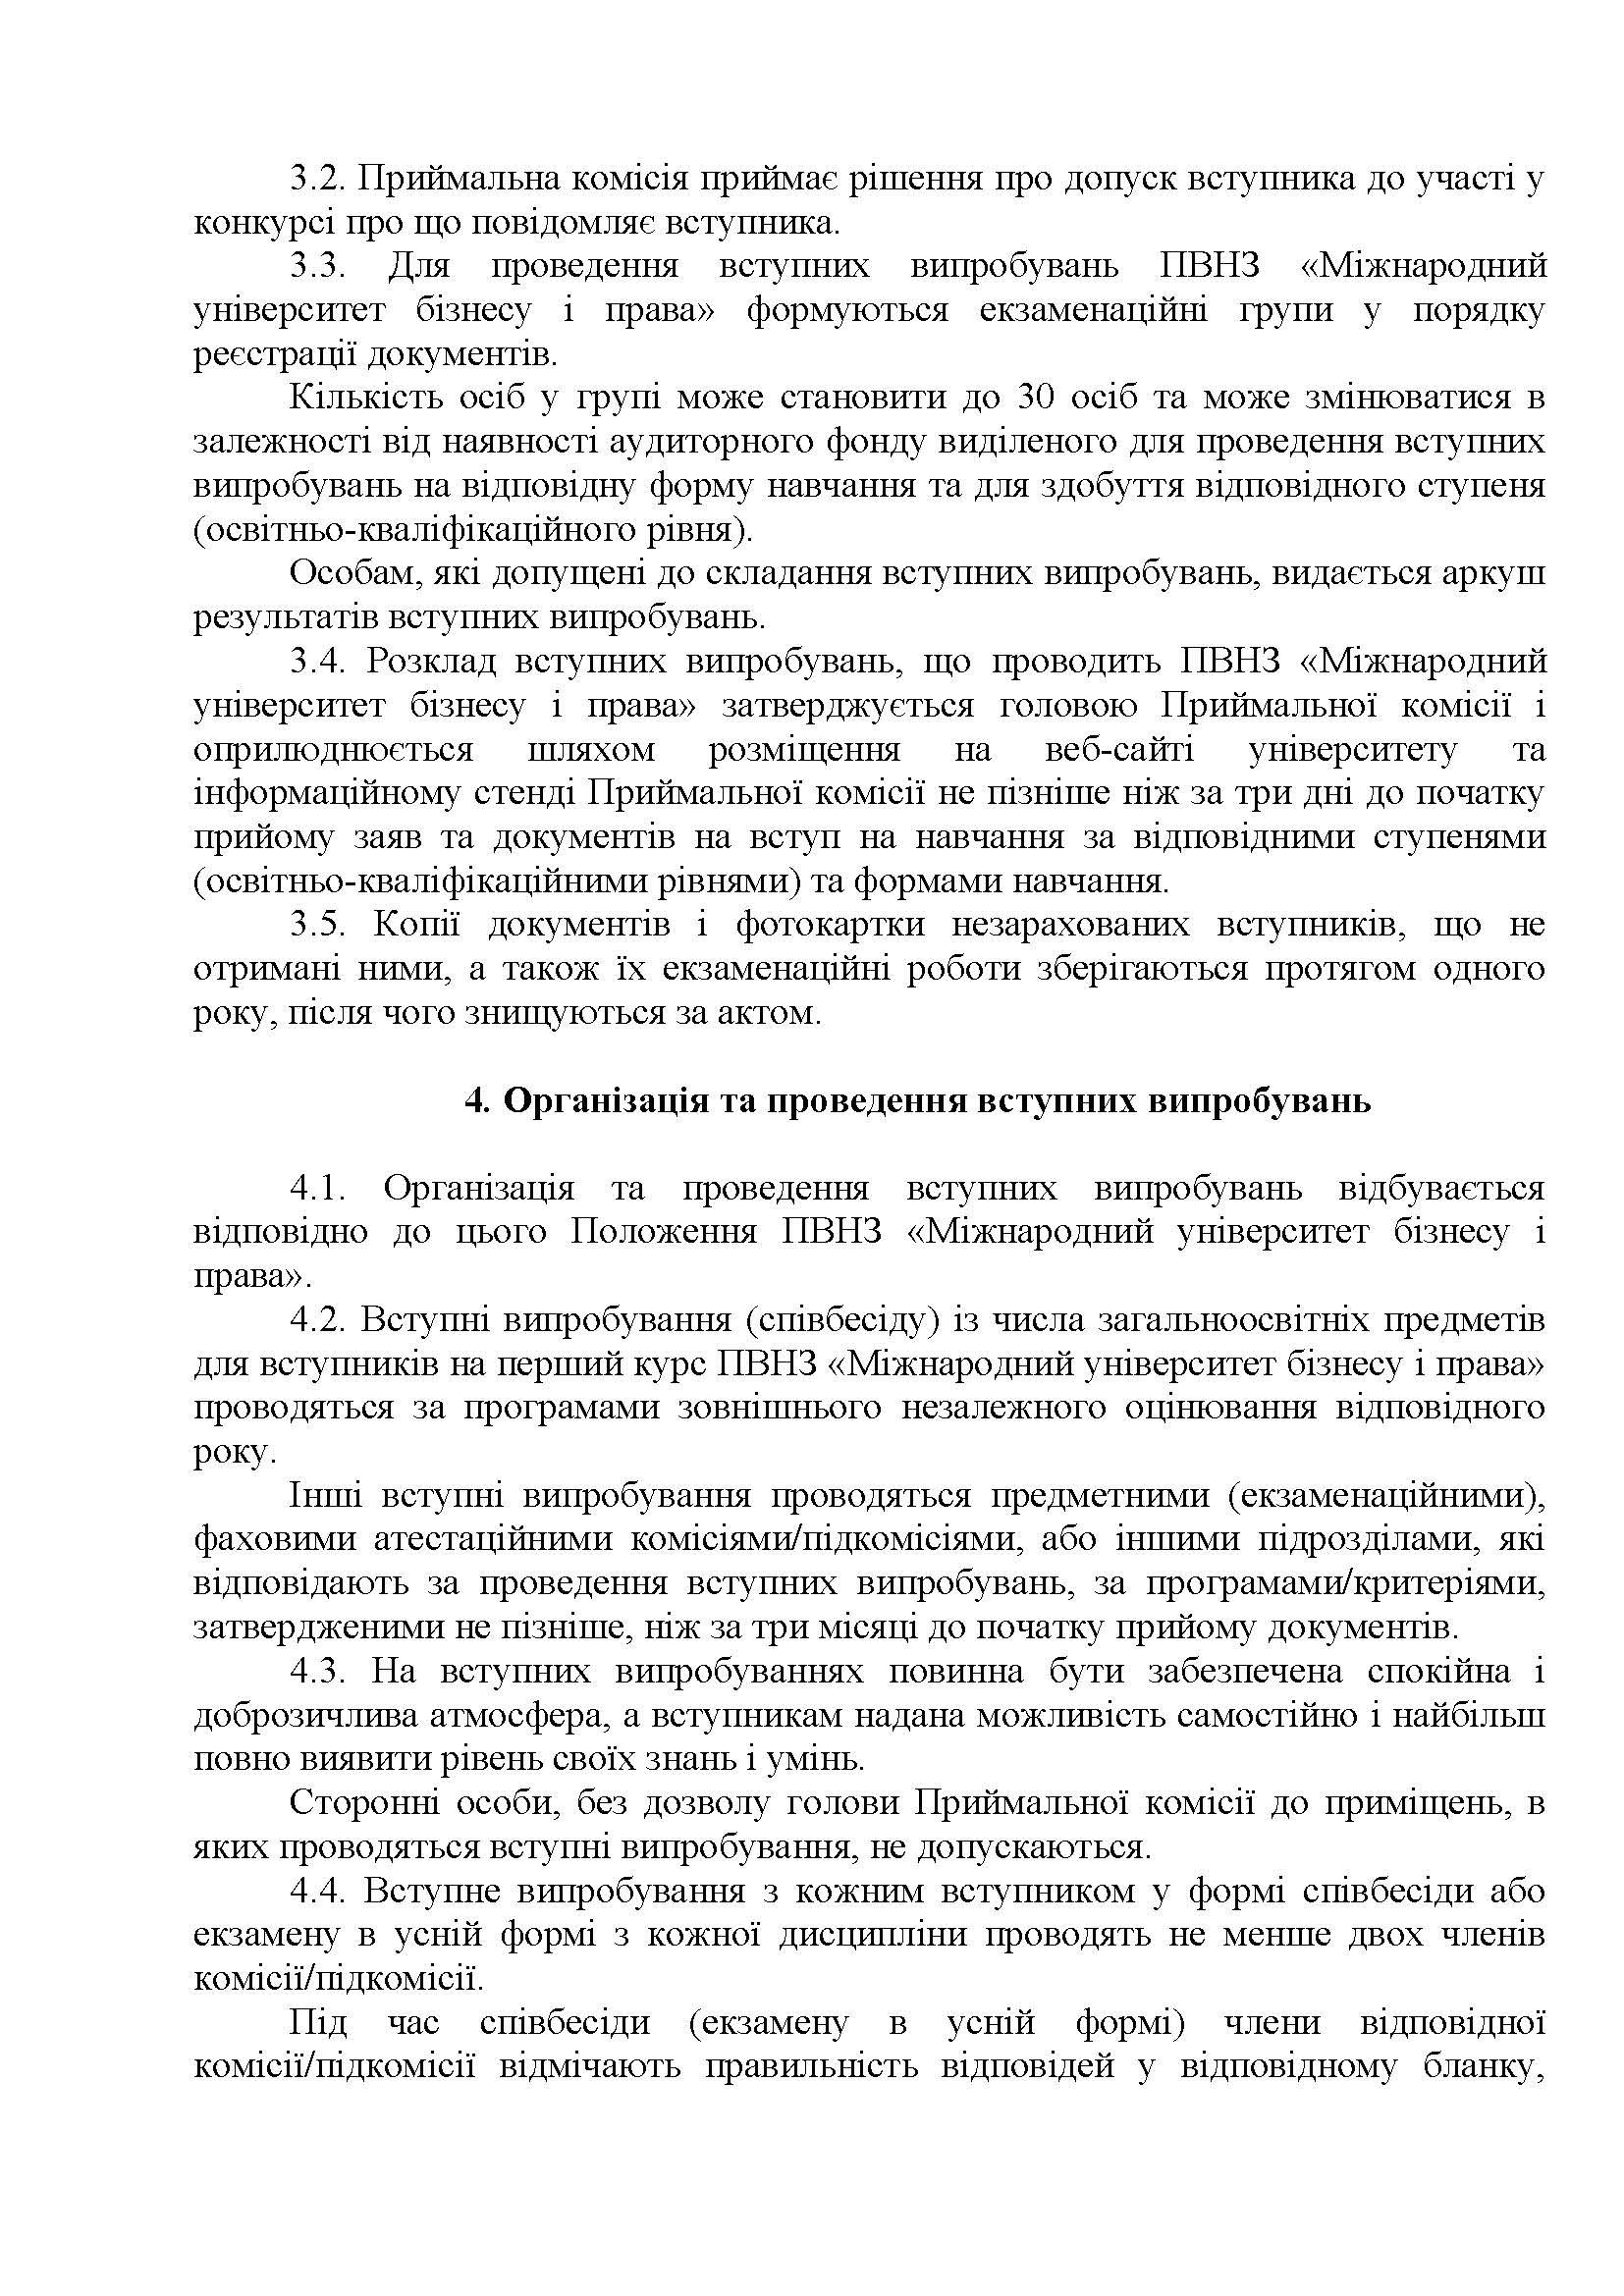 ПОЛОЖЕННЯ про Приймальну комисию 2017_Страница_06